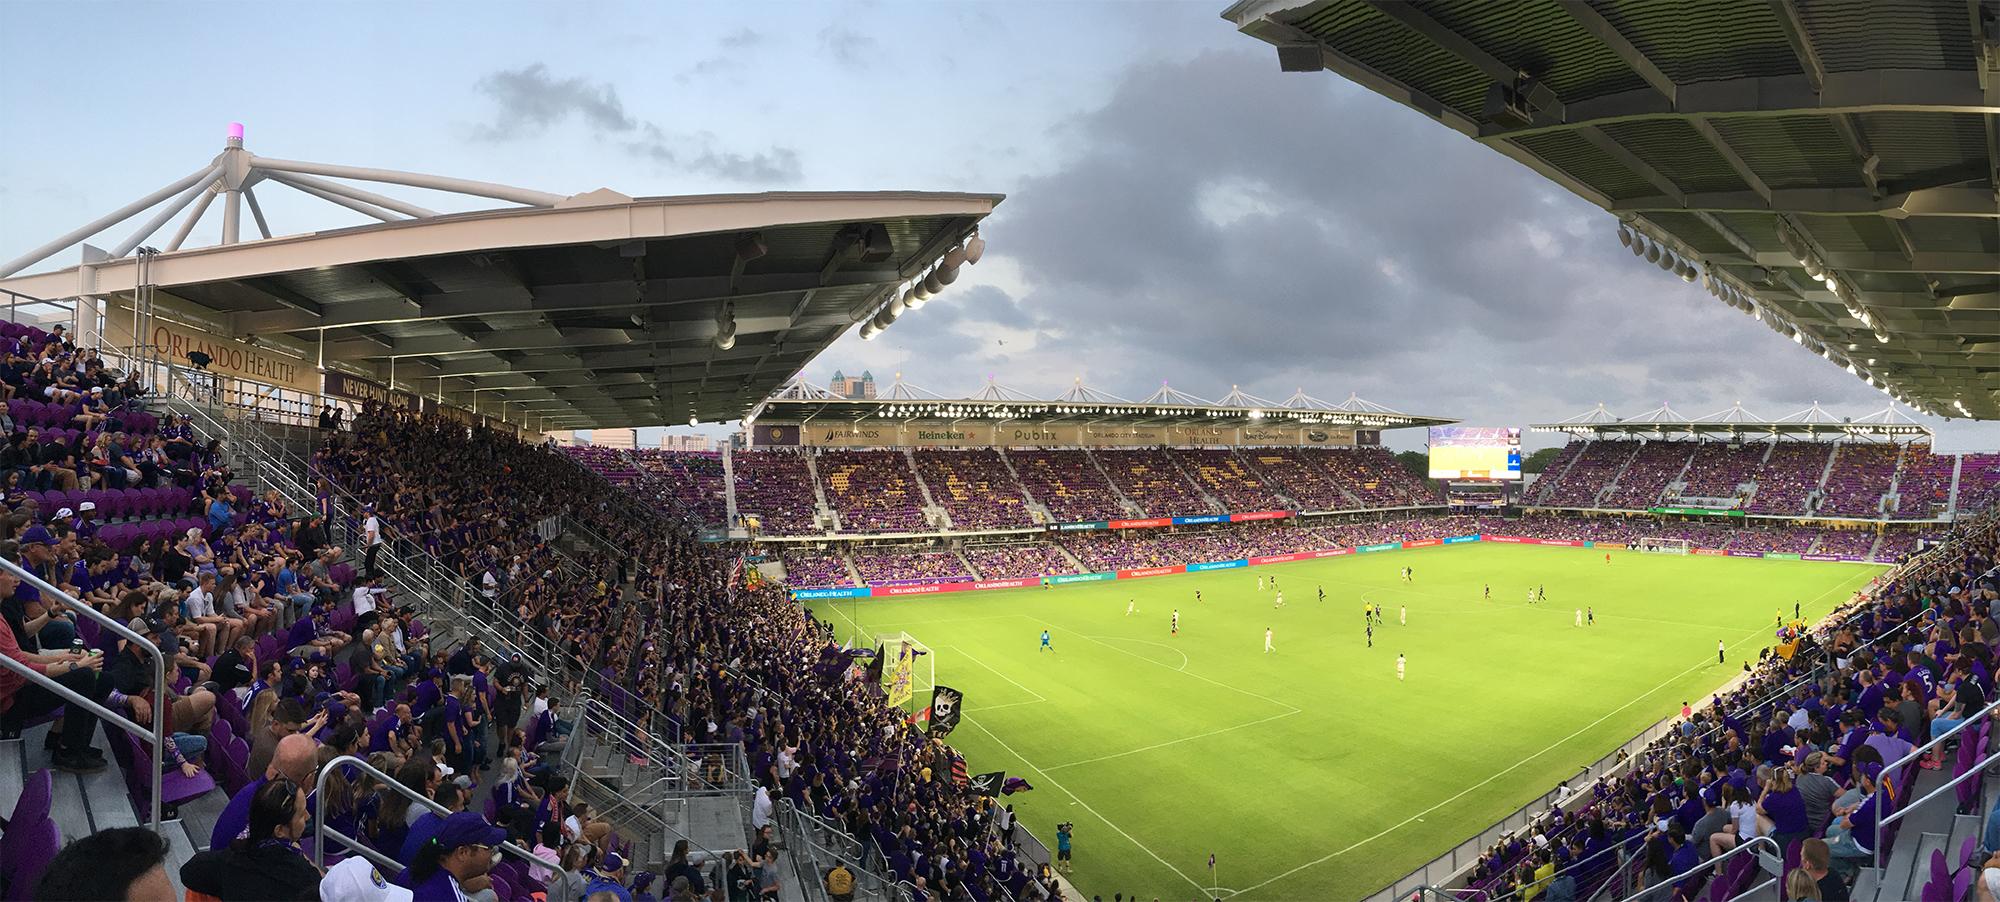 Orlando City Stadium - Things To Do In Orlando Besides Theme Parks